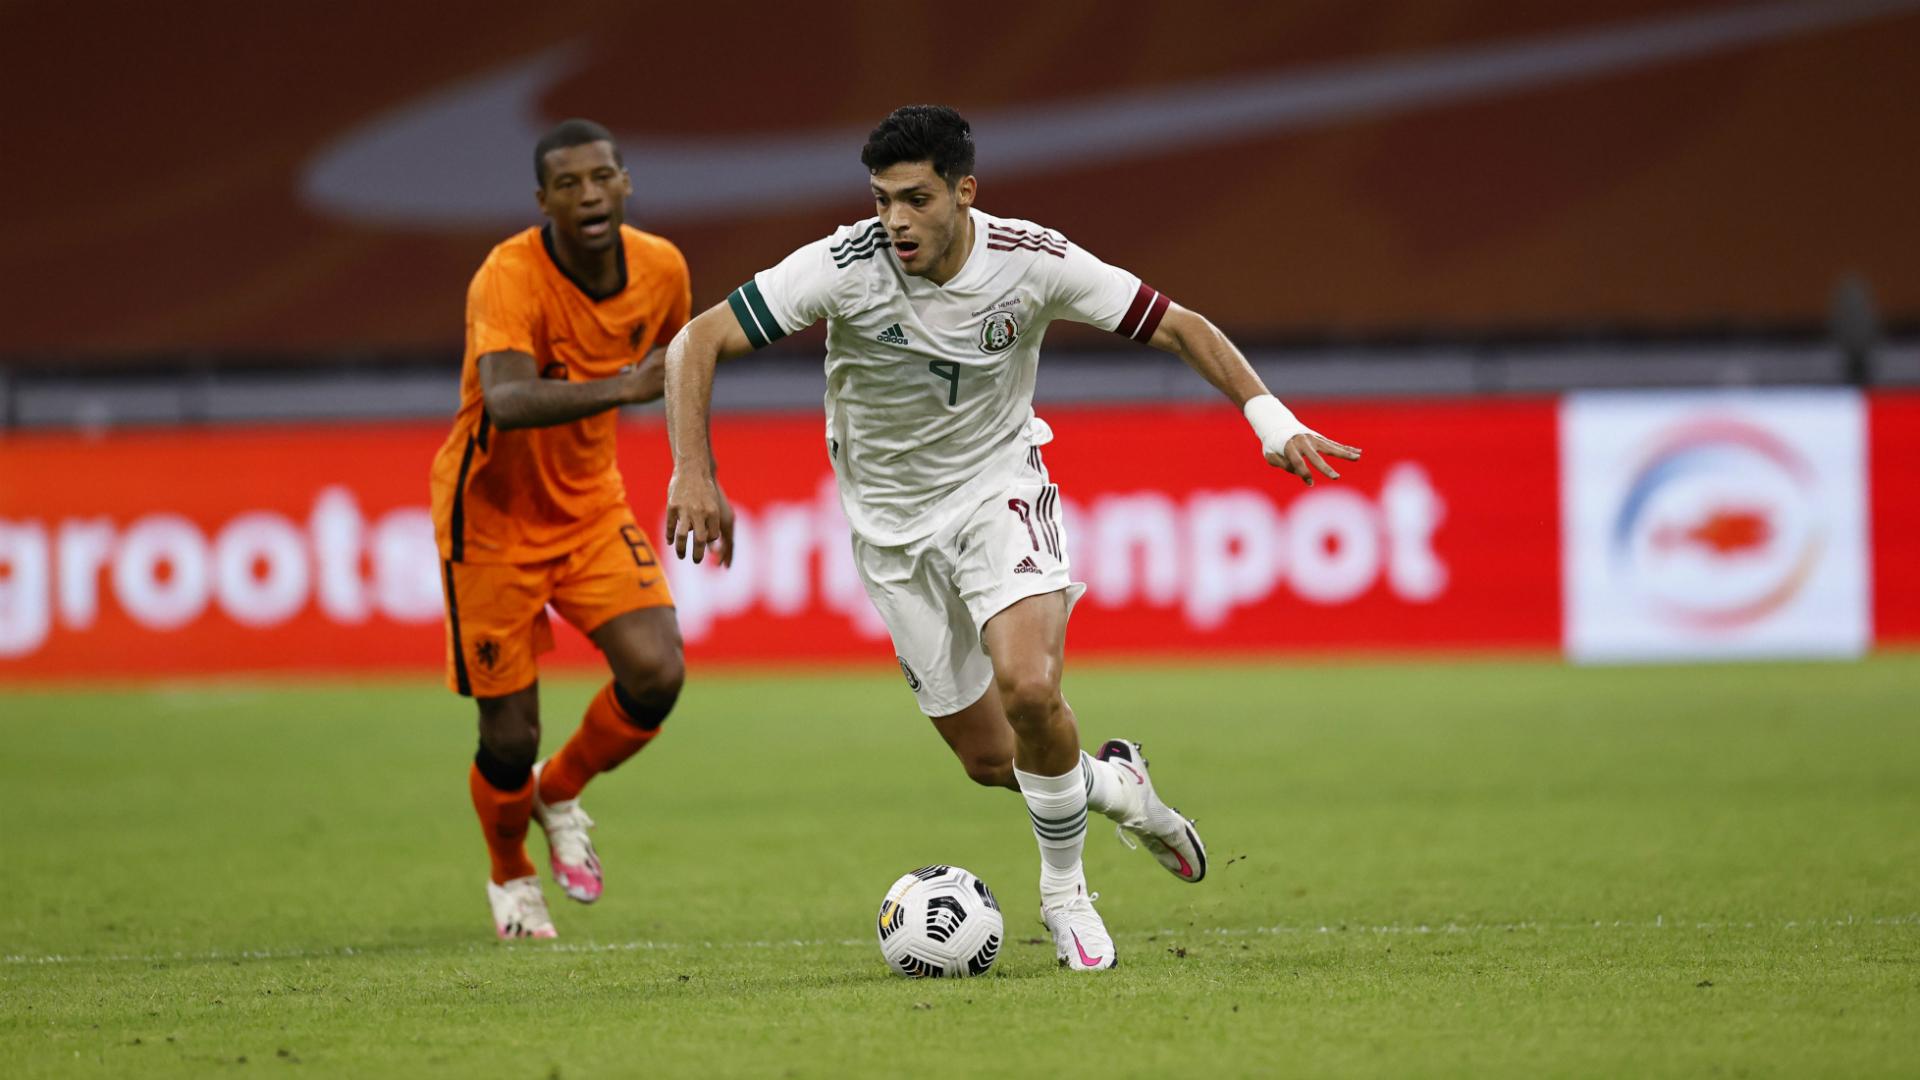 Netherlands 0-1 Mexico: De Boer era begins with defeat